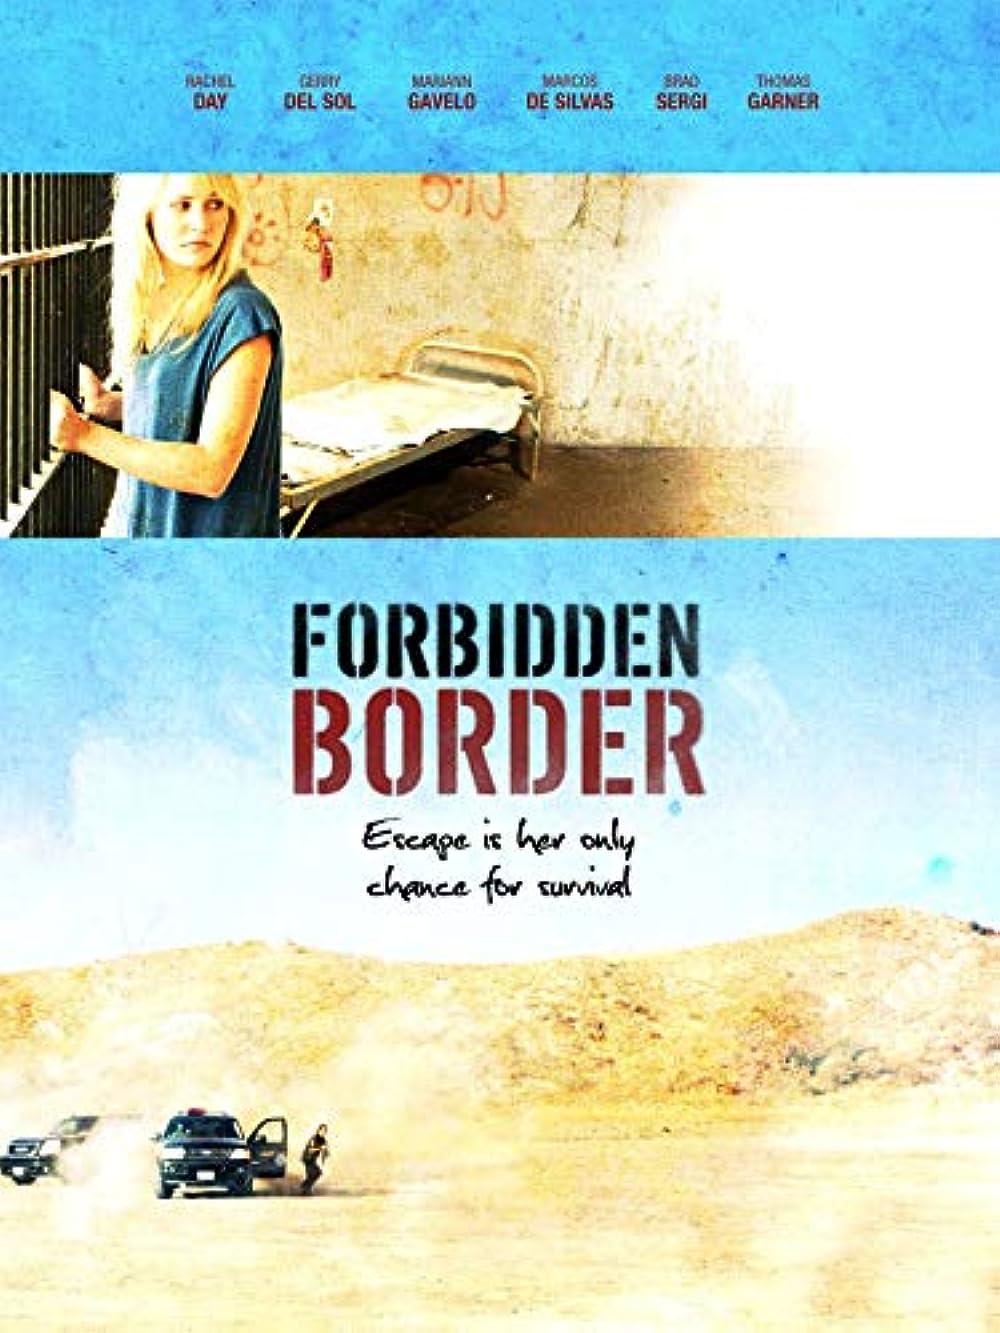 Forbidden Border 2009 Imdb